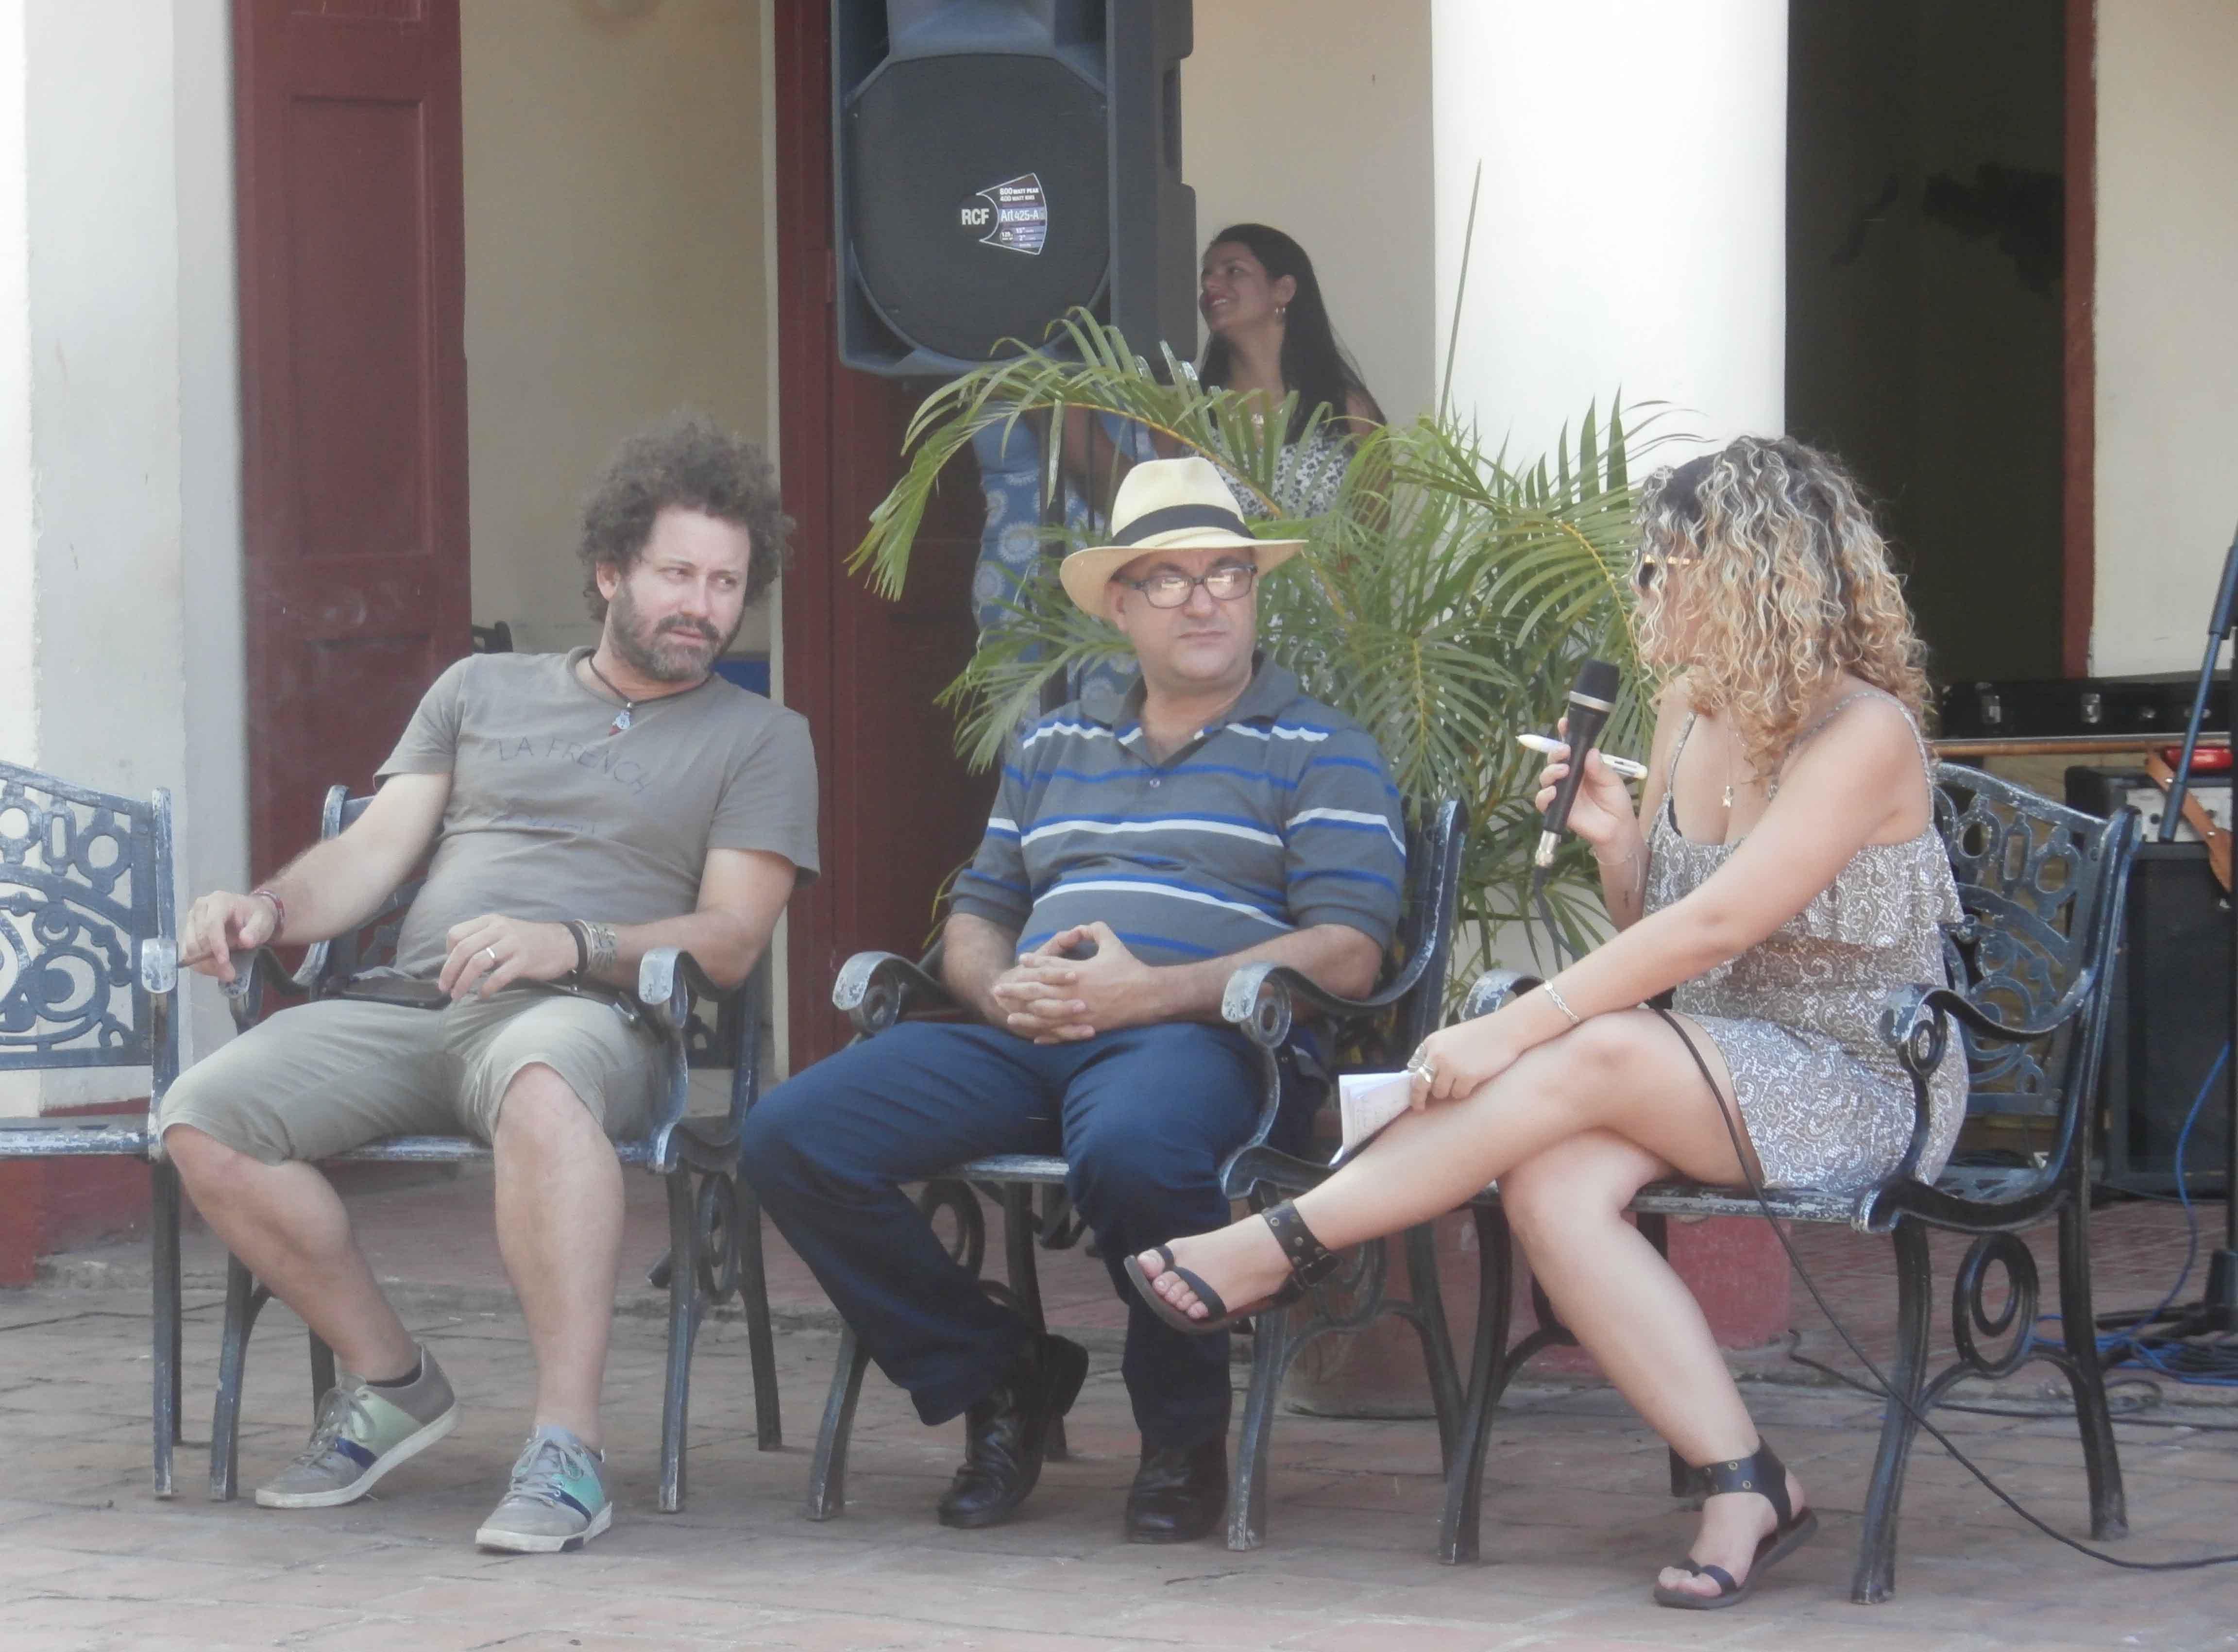 Raul Paz, Ernesto Limia, Guayabera, Universidad, Sancti Spíritus